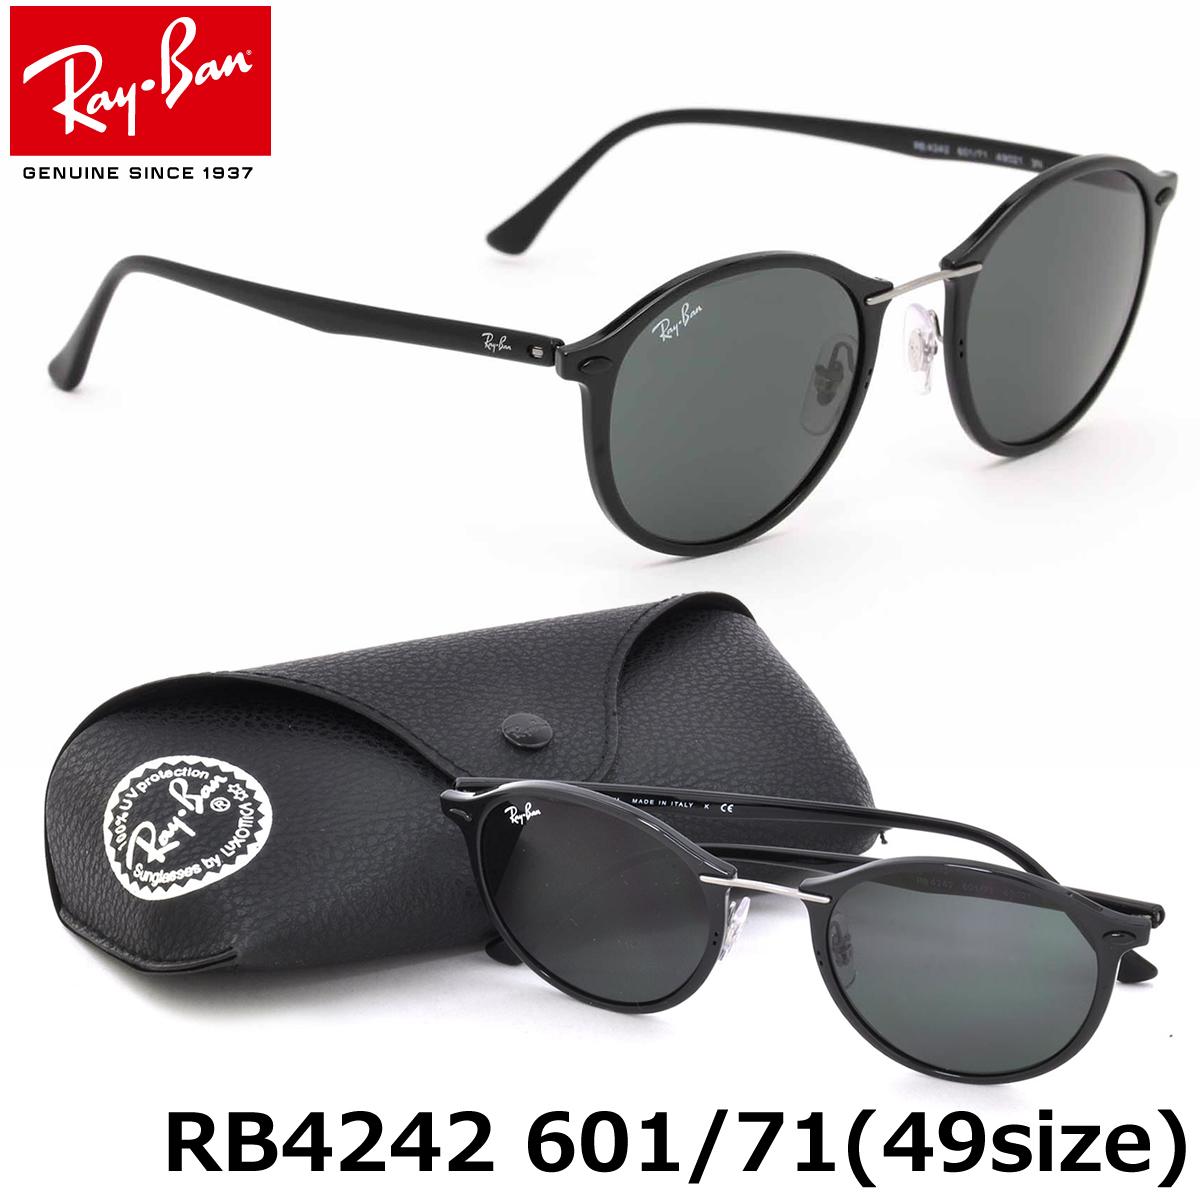 0a17e4360a Ray-Ban sunglasses technical center light lei Ray-Ban RB4242 601 71 49 size  Ray-Ban RAYBAN TECH LIGHT RAY 60171 ROUND round-maru glasses men gap Dis